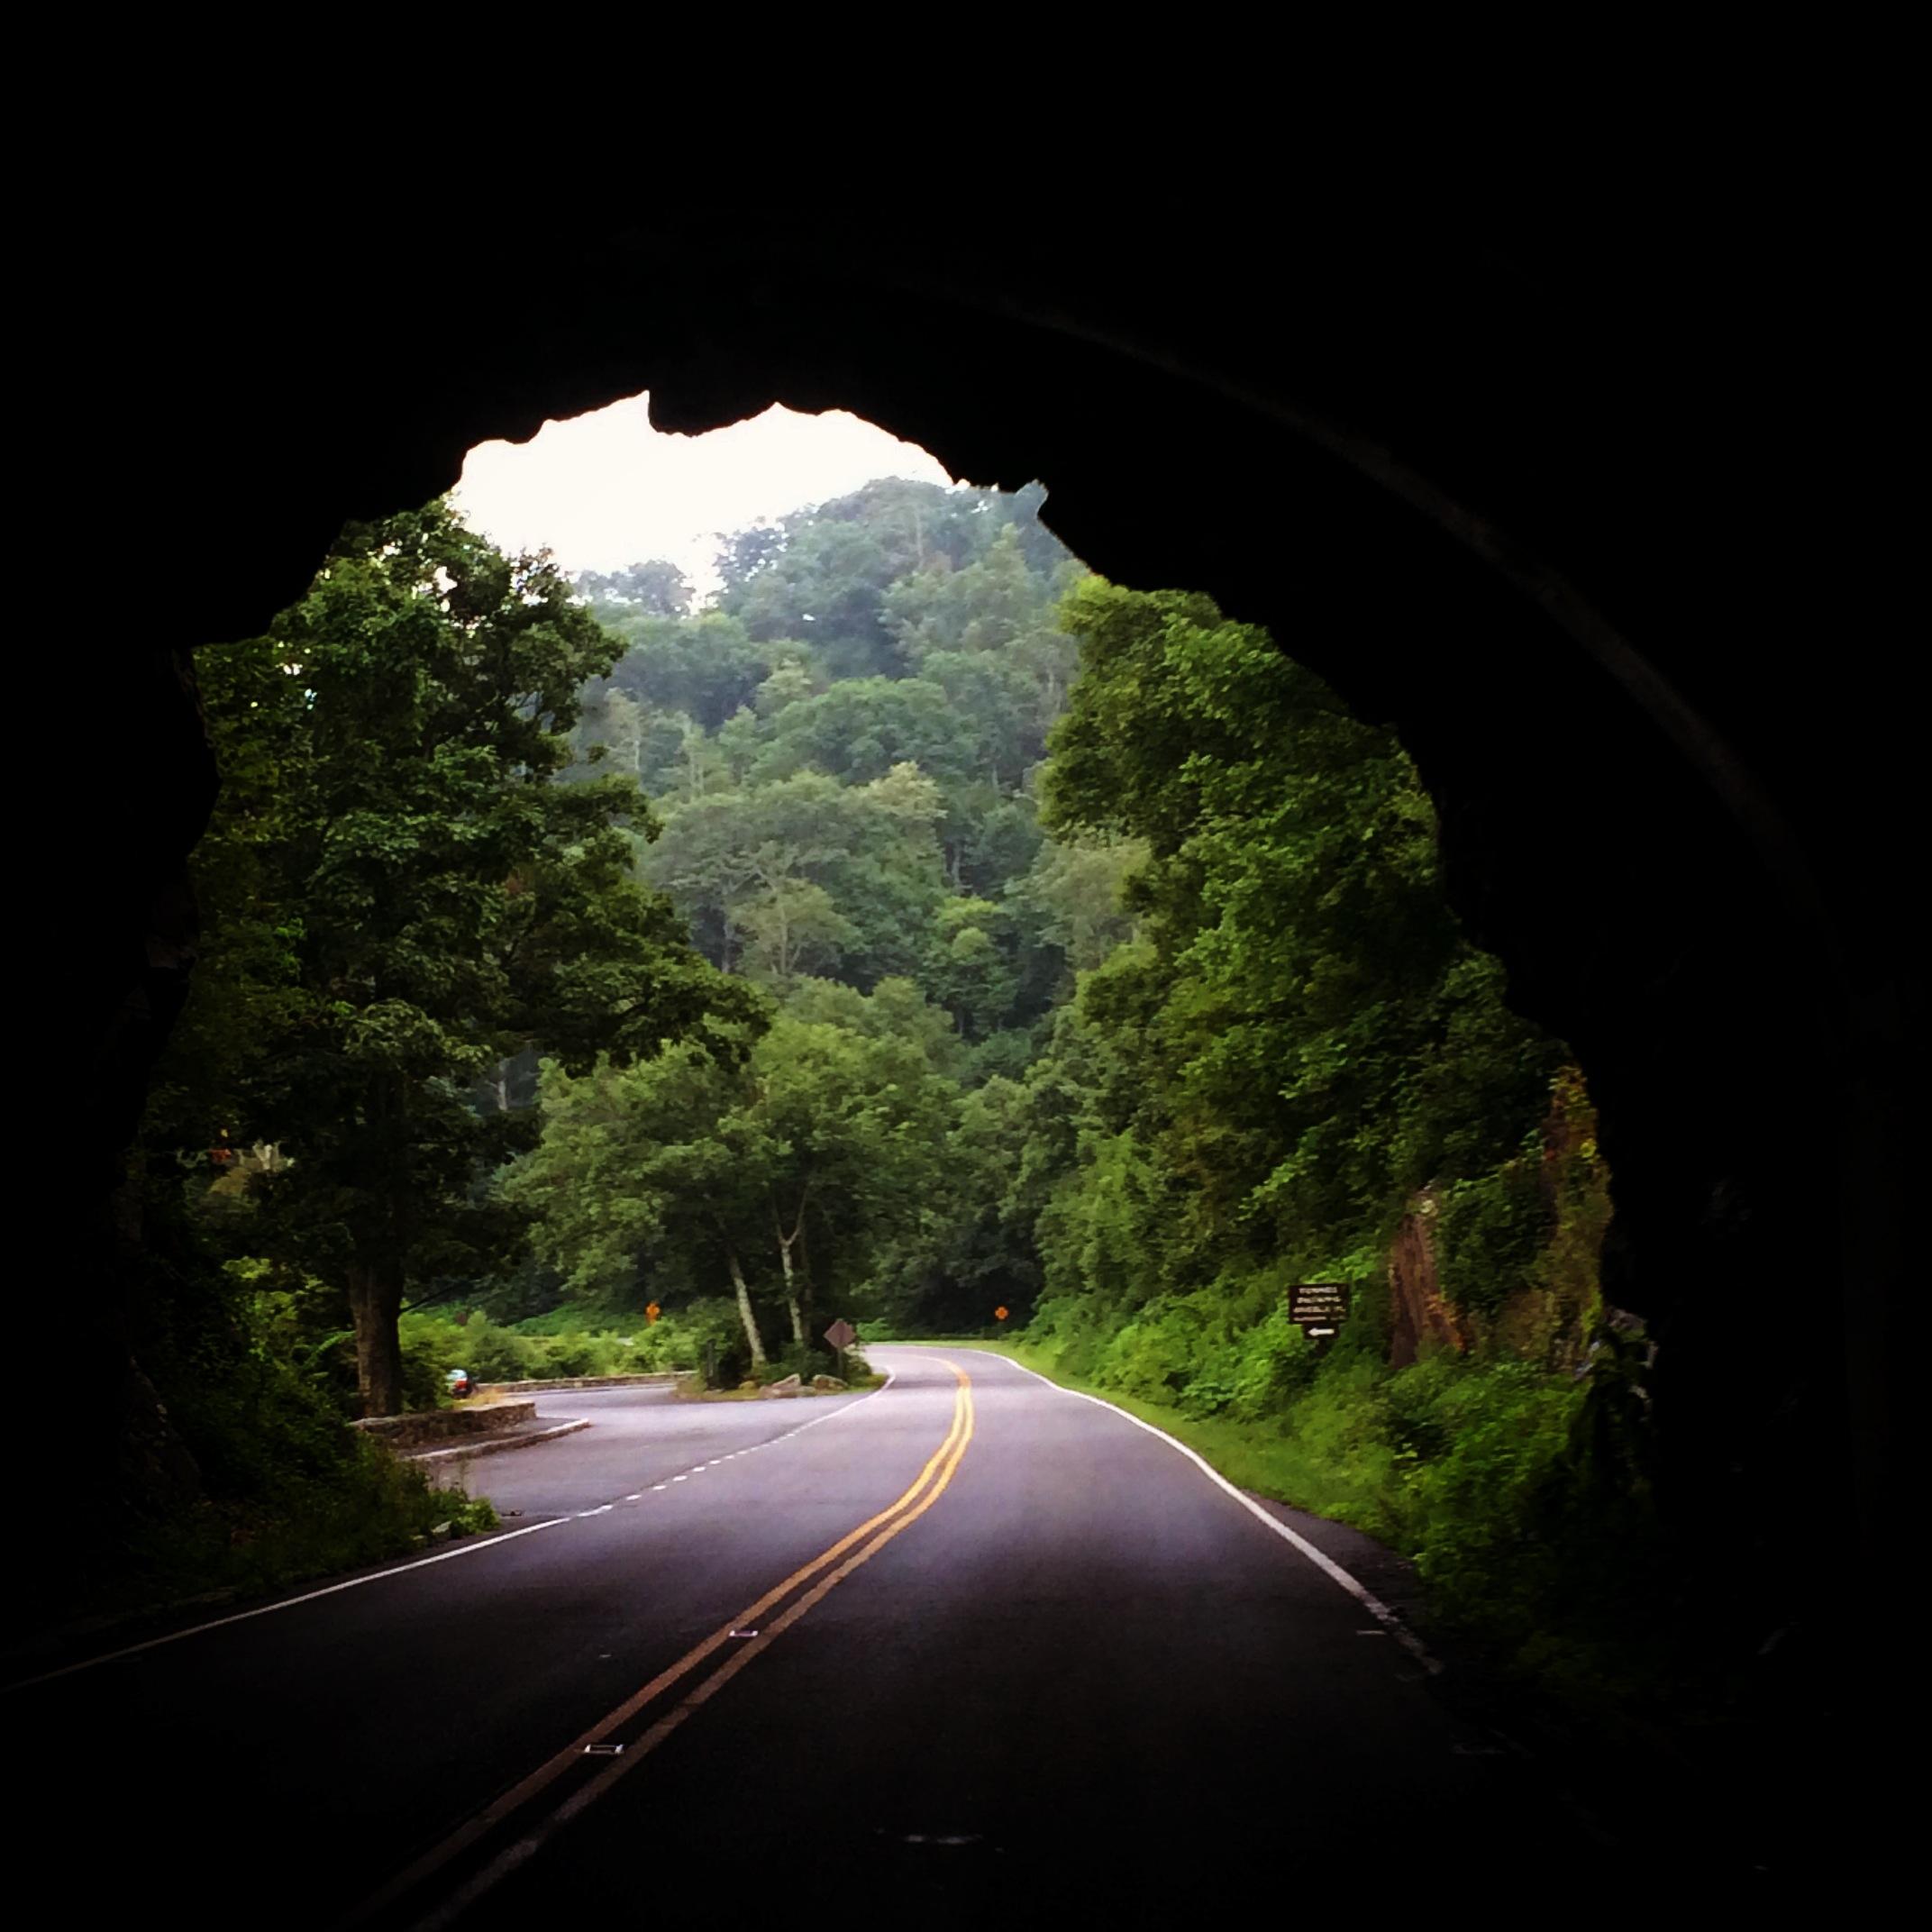 marys-rock-tunnel-shenandoah-national-park